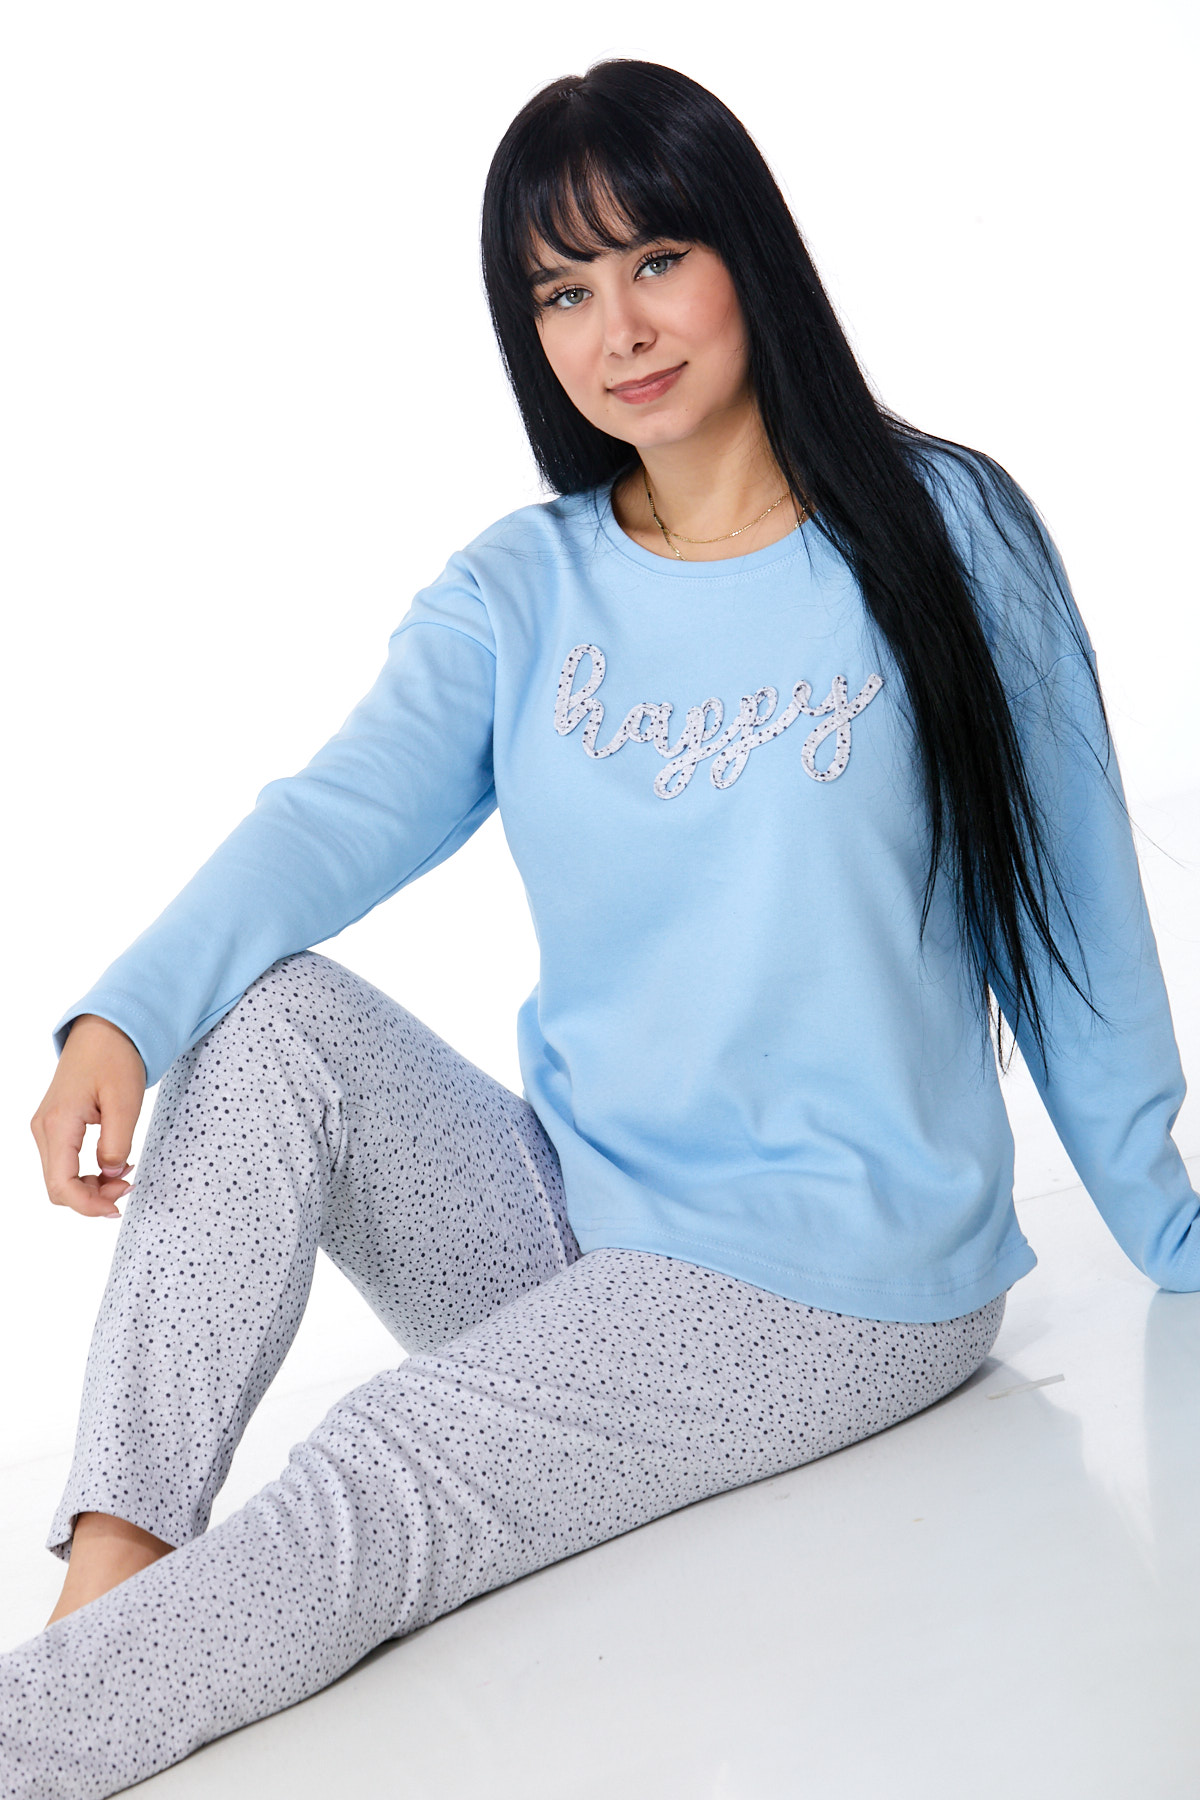 Dámské pyžamo comfort teplé 1B0987